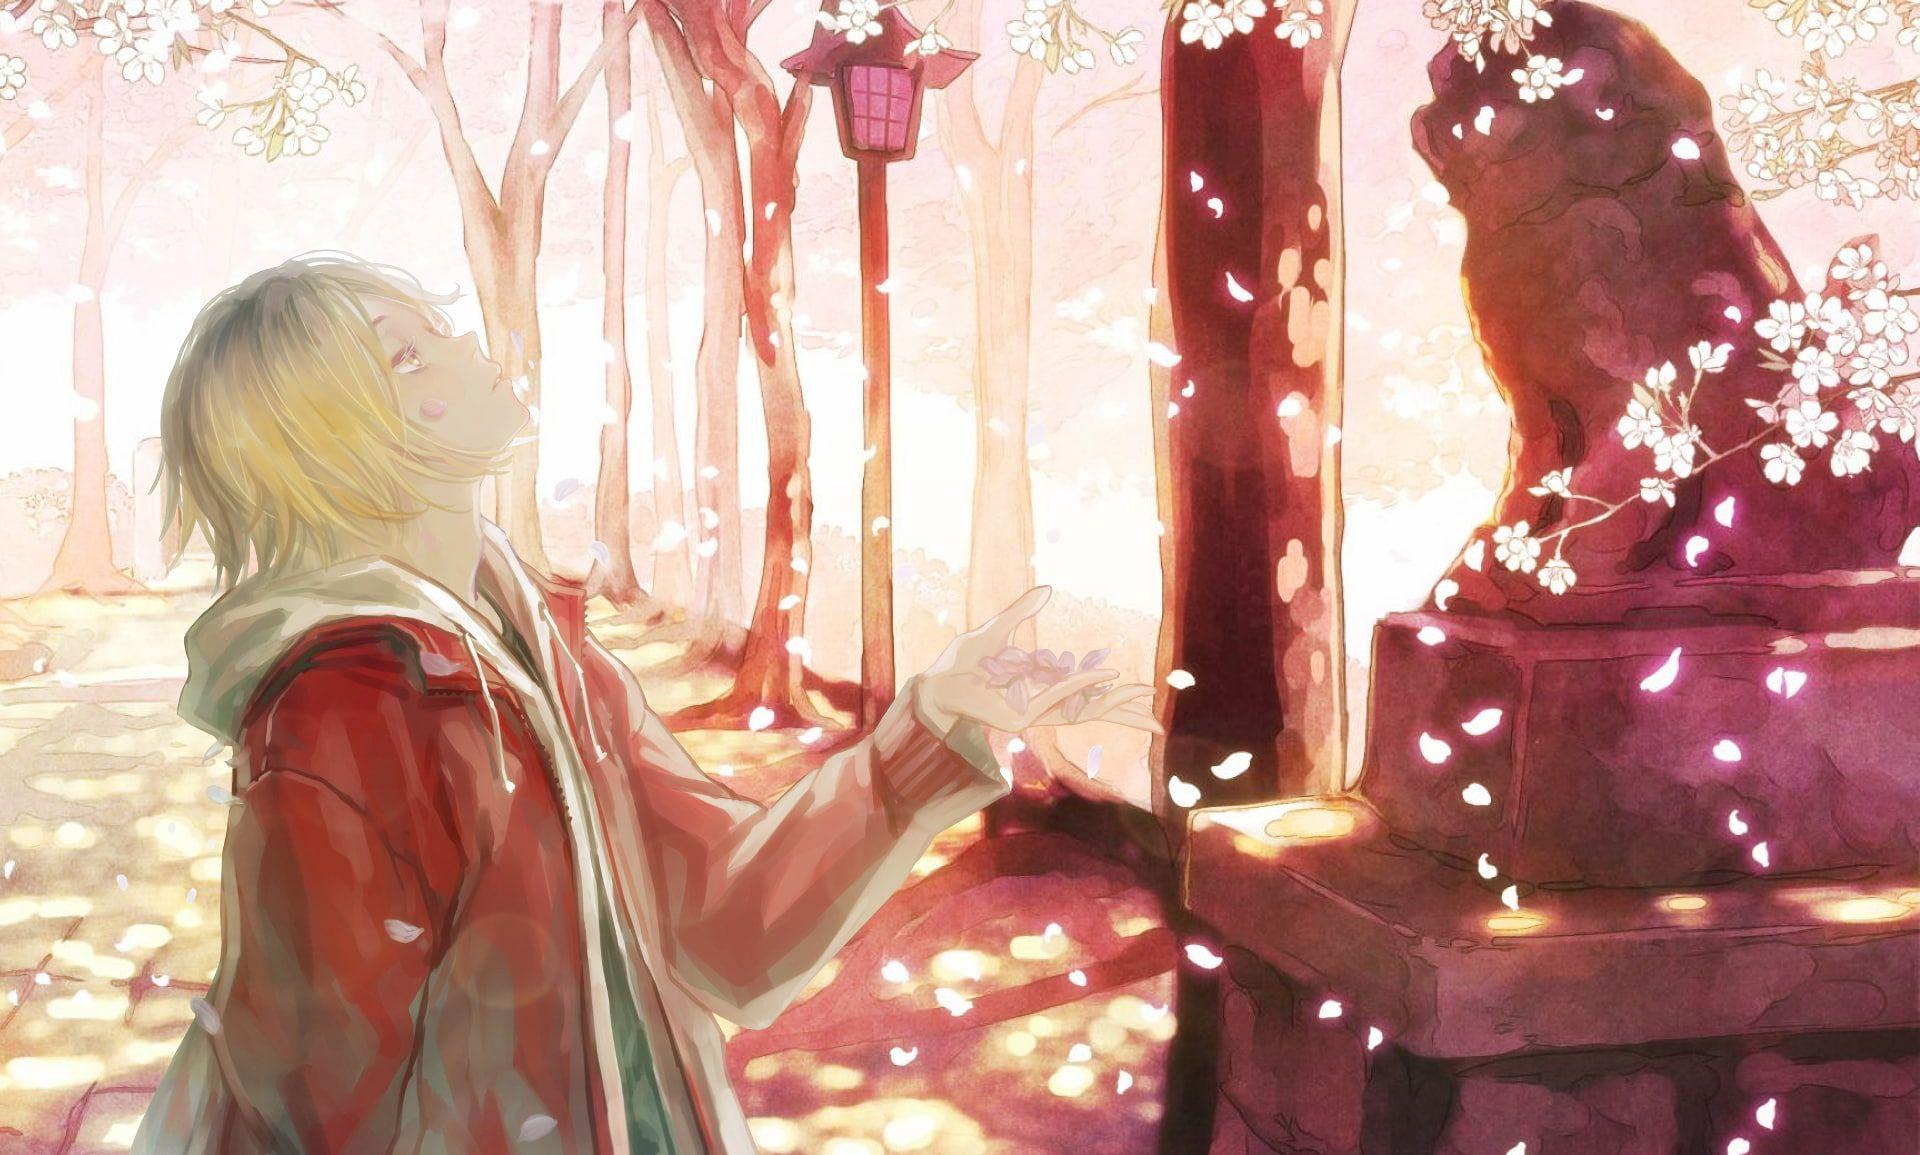 Haikyuu Anime Boys Kozume Kenma 1080p Wallpaper Hdwallpaper Desktop In 2020 Haikyuu Kenma Kenma Kozume